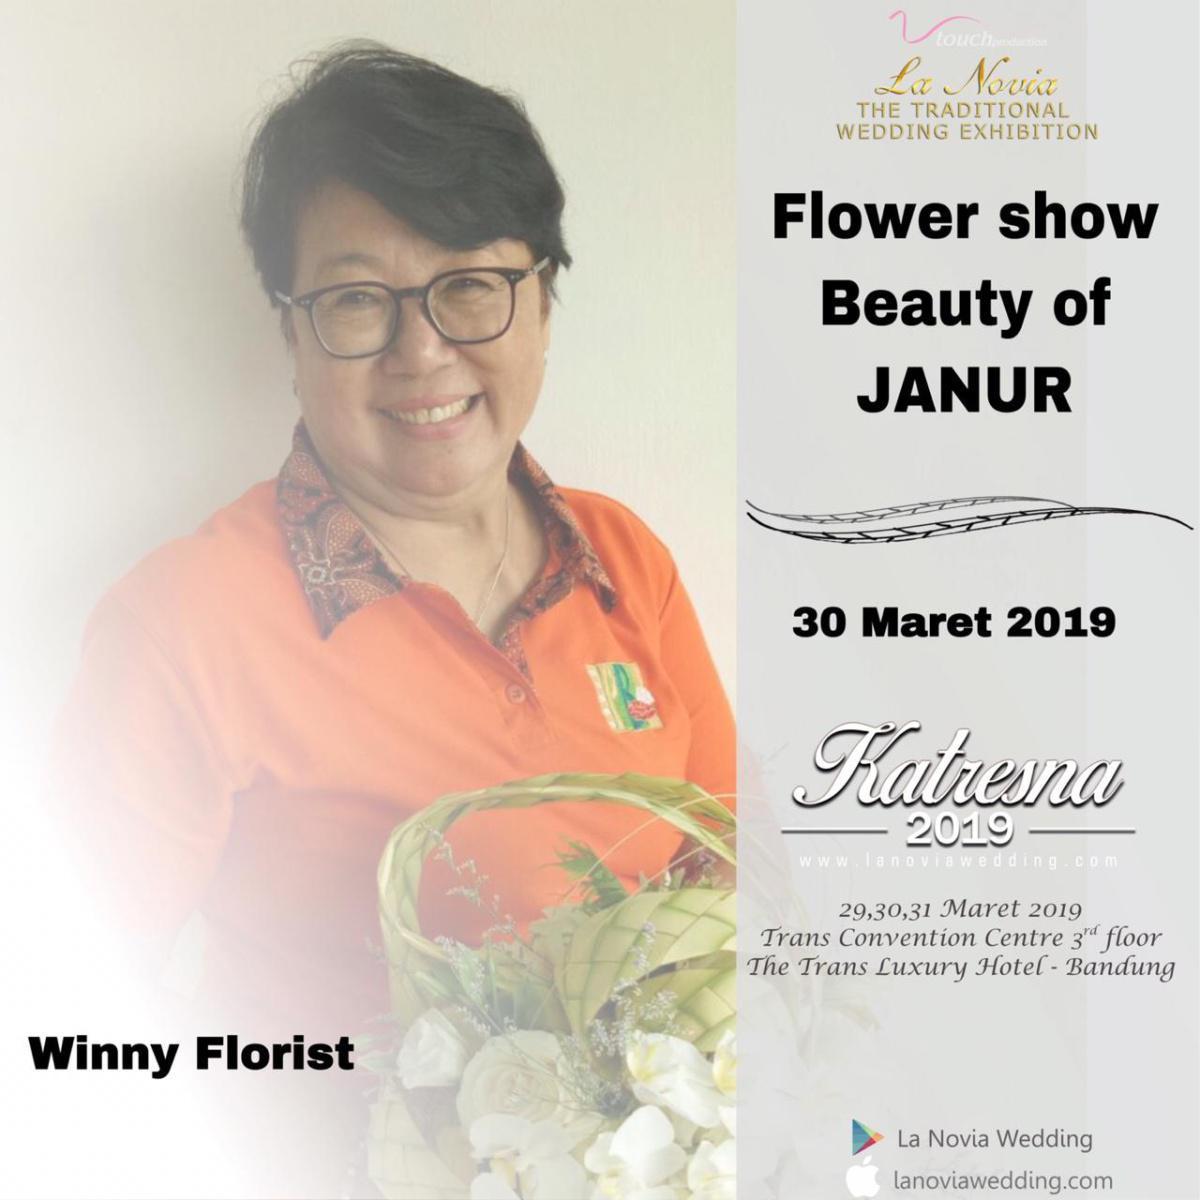 Winny Florist